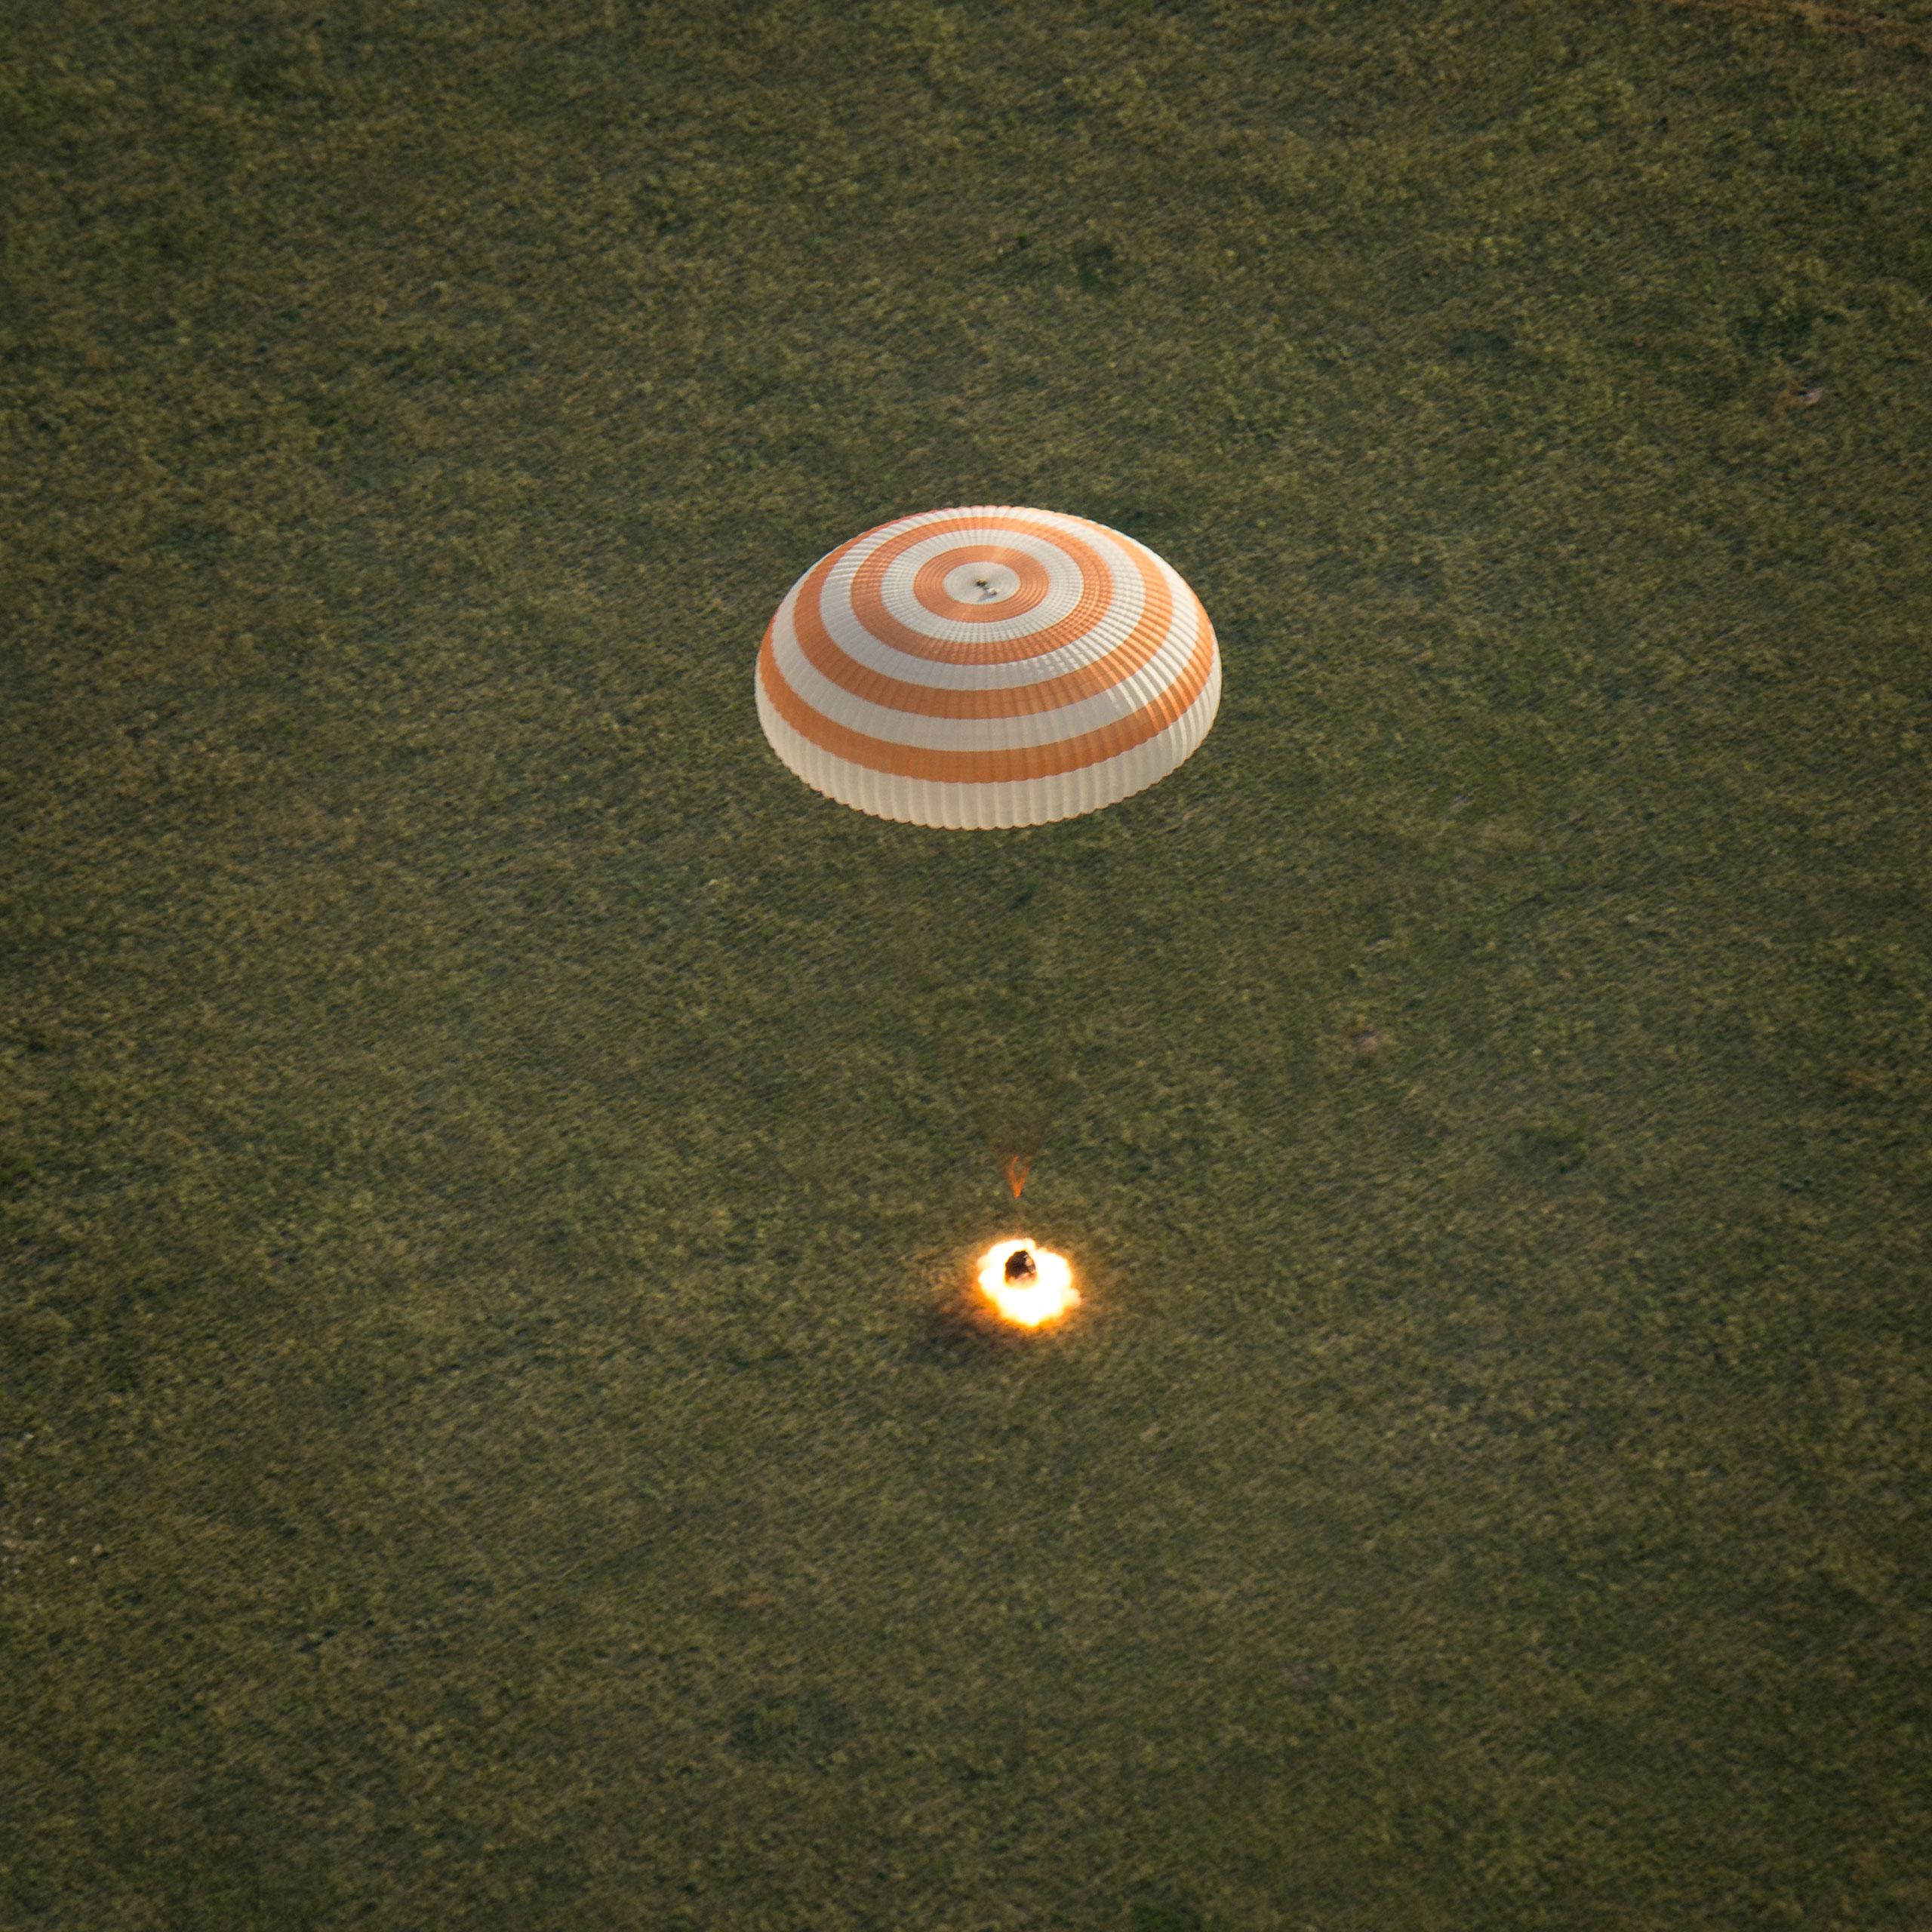 The Soyuz TMA-15M spacecraft lands with Expedition 43 commander Terry Virts of NASA, cosmonaut Anton Shkaplerov of the Russian Federal Space Agency (Roscosmos), and Italian astronaut Samantha Cristoforetti from European Space Agency (ESA) near Zhezkazgan, Kazakhstan on June 11, 2015.